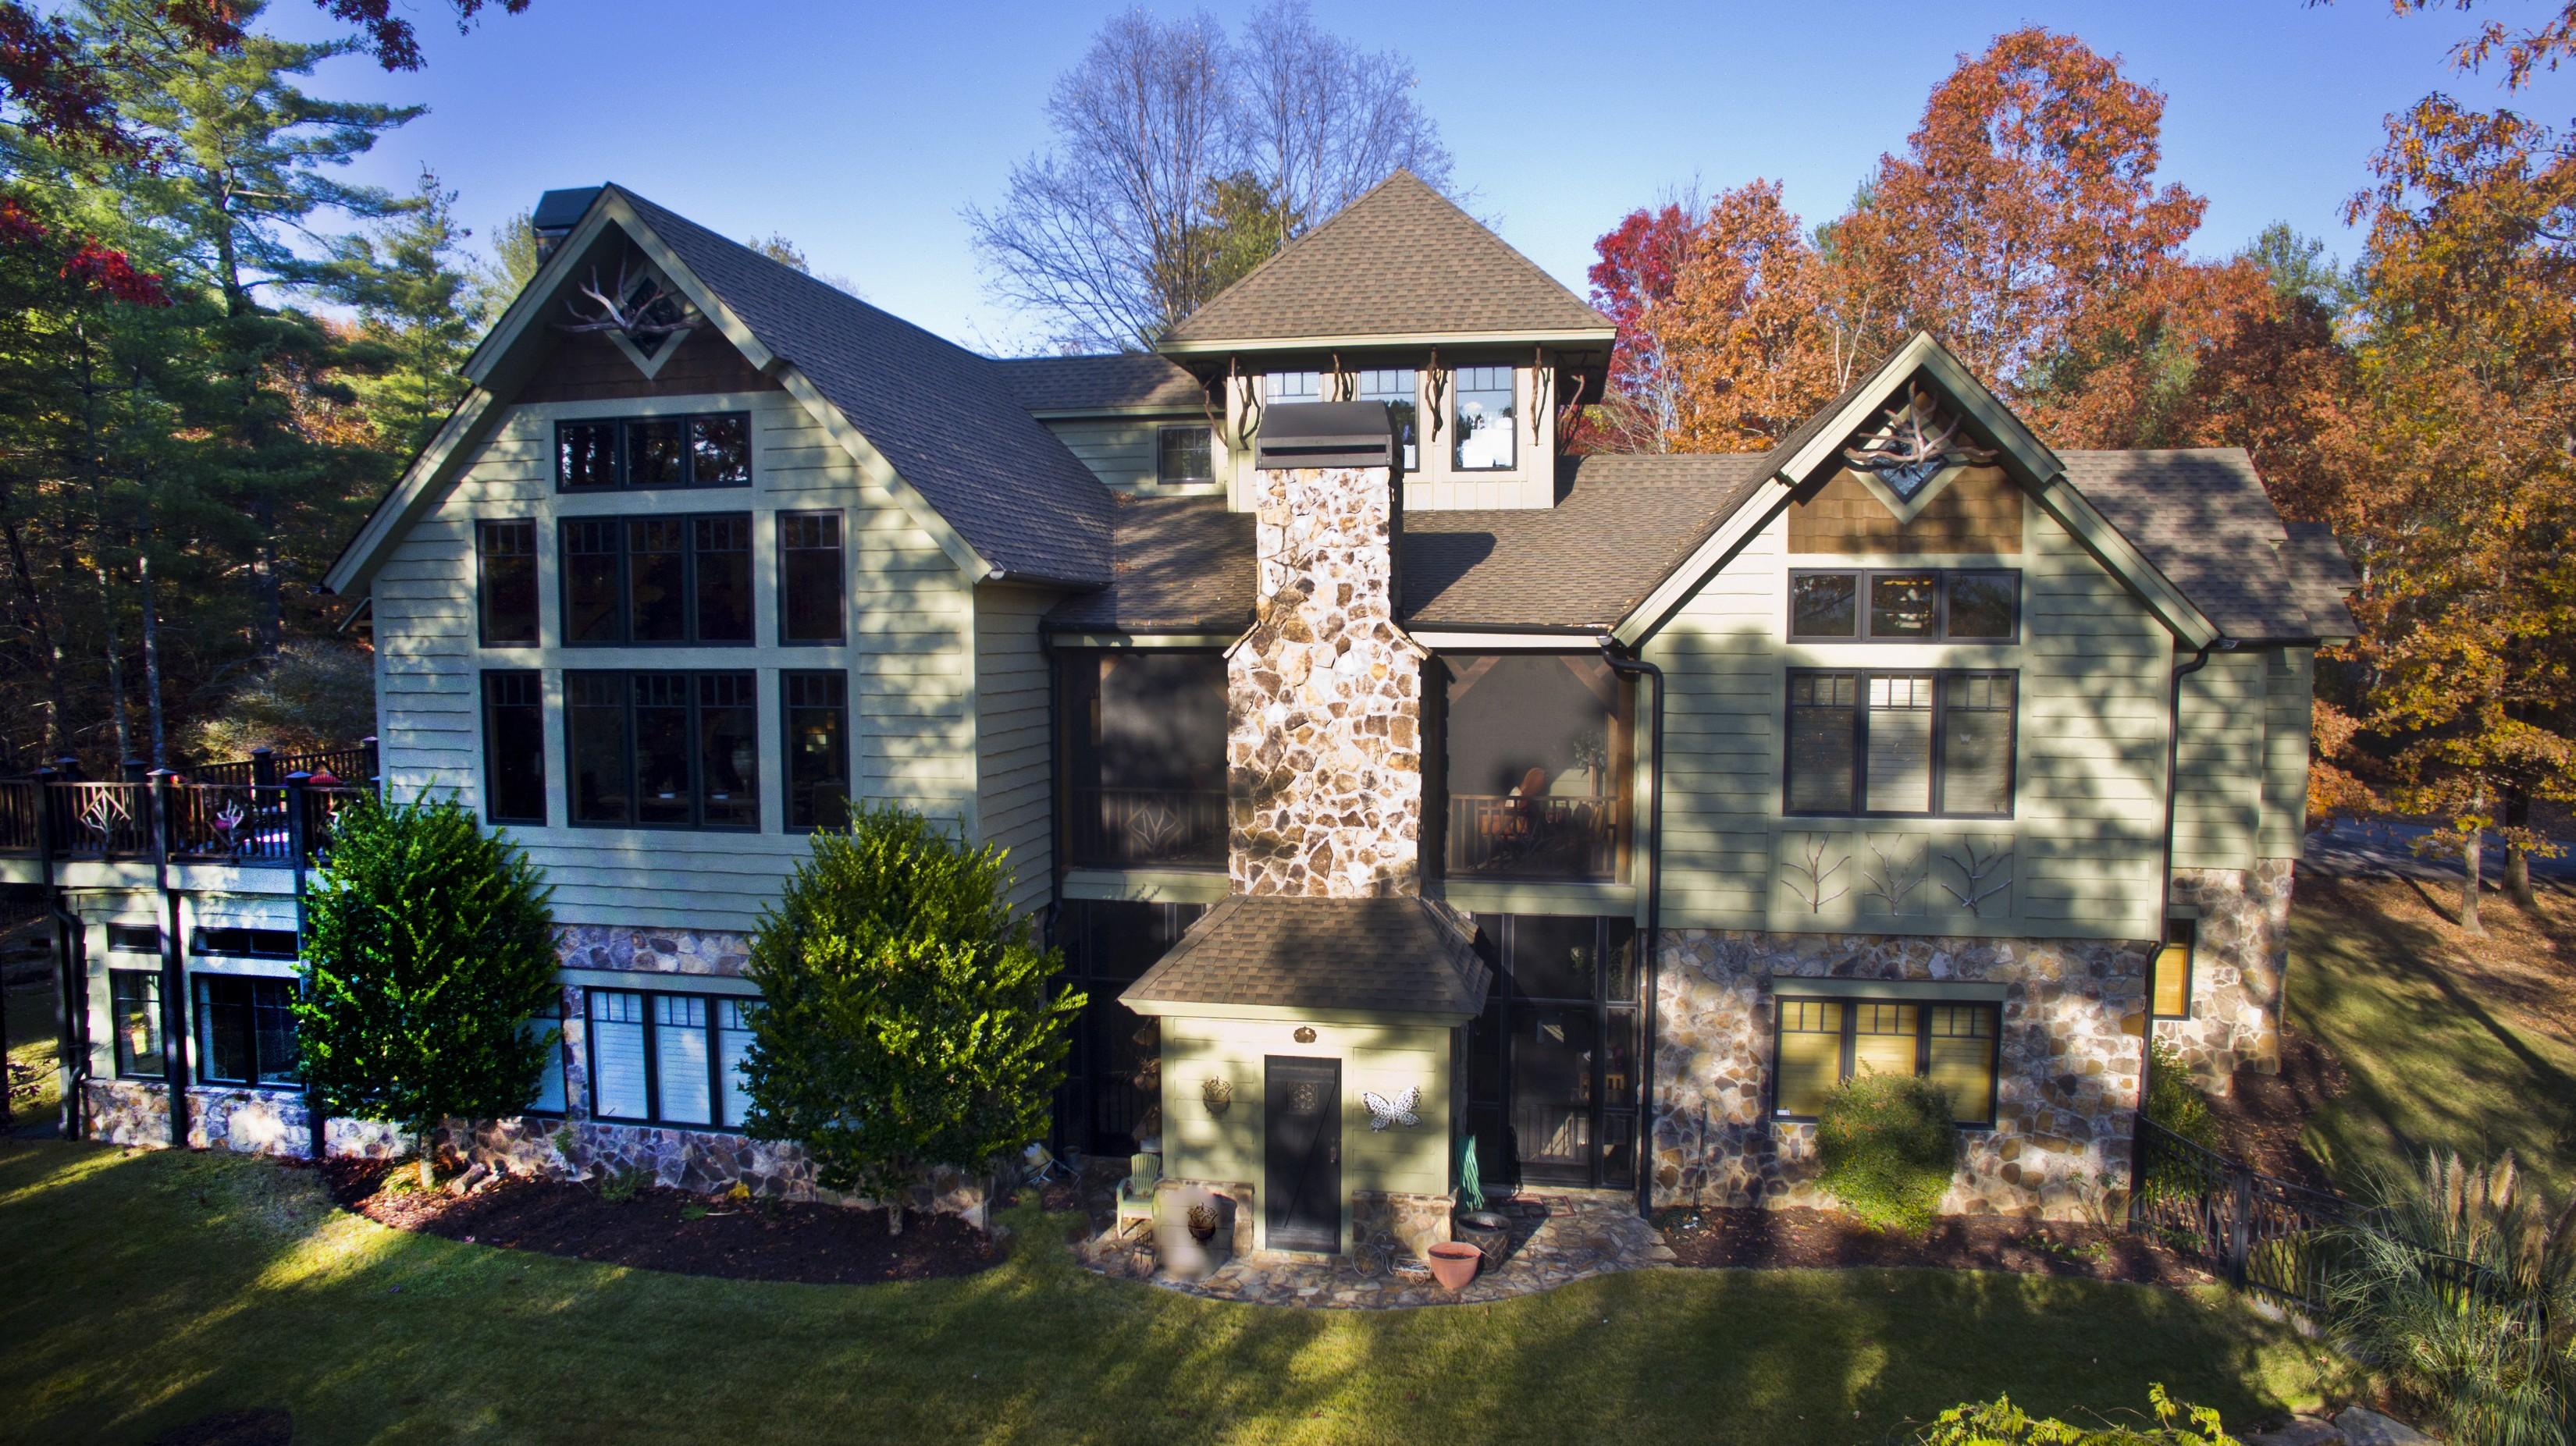 Villa per Vendita alle ore Spacious & Enchanting Mill Creek Post & Beam Mountain-Lake Home 211 Vineyard Park Sunset, Carolina Del Sud, 29685 Stati Uniti